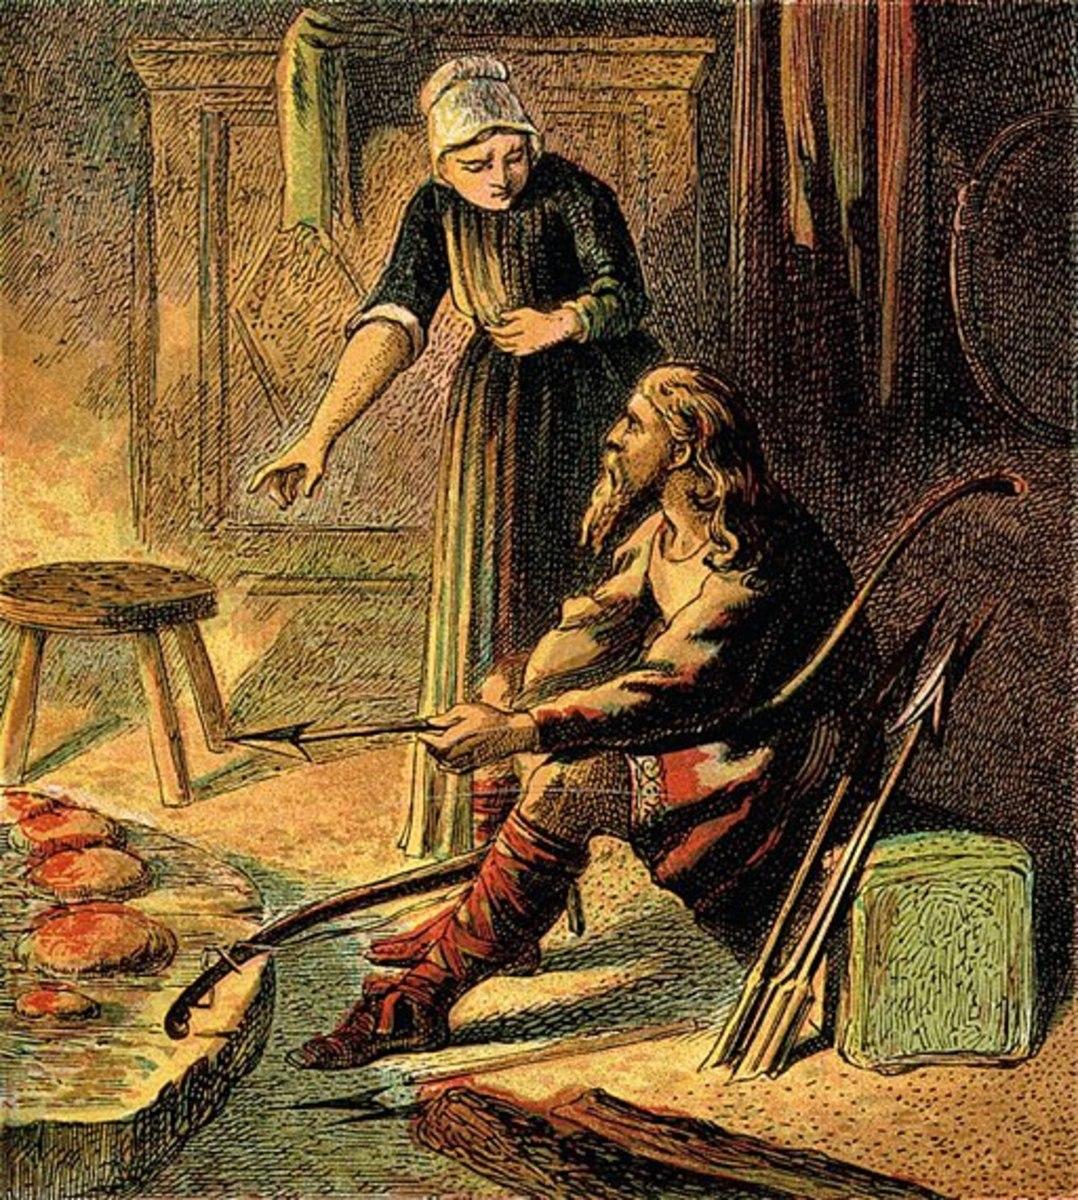 King Alfred Burns the Cakes. Attribution: Joseph Martin Kronheim (1810 - 96)